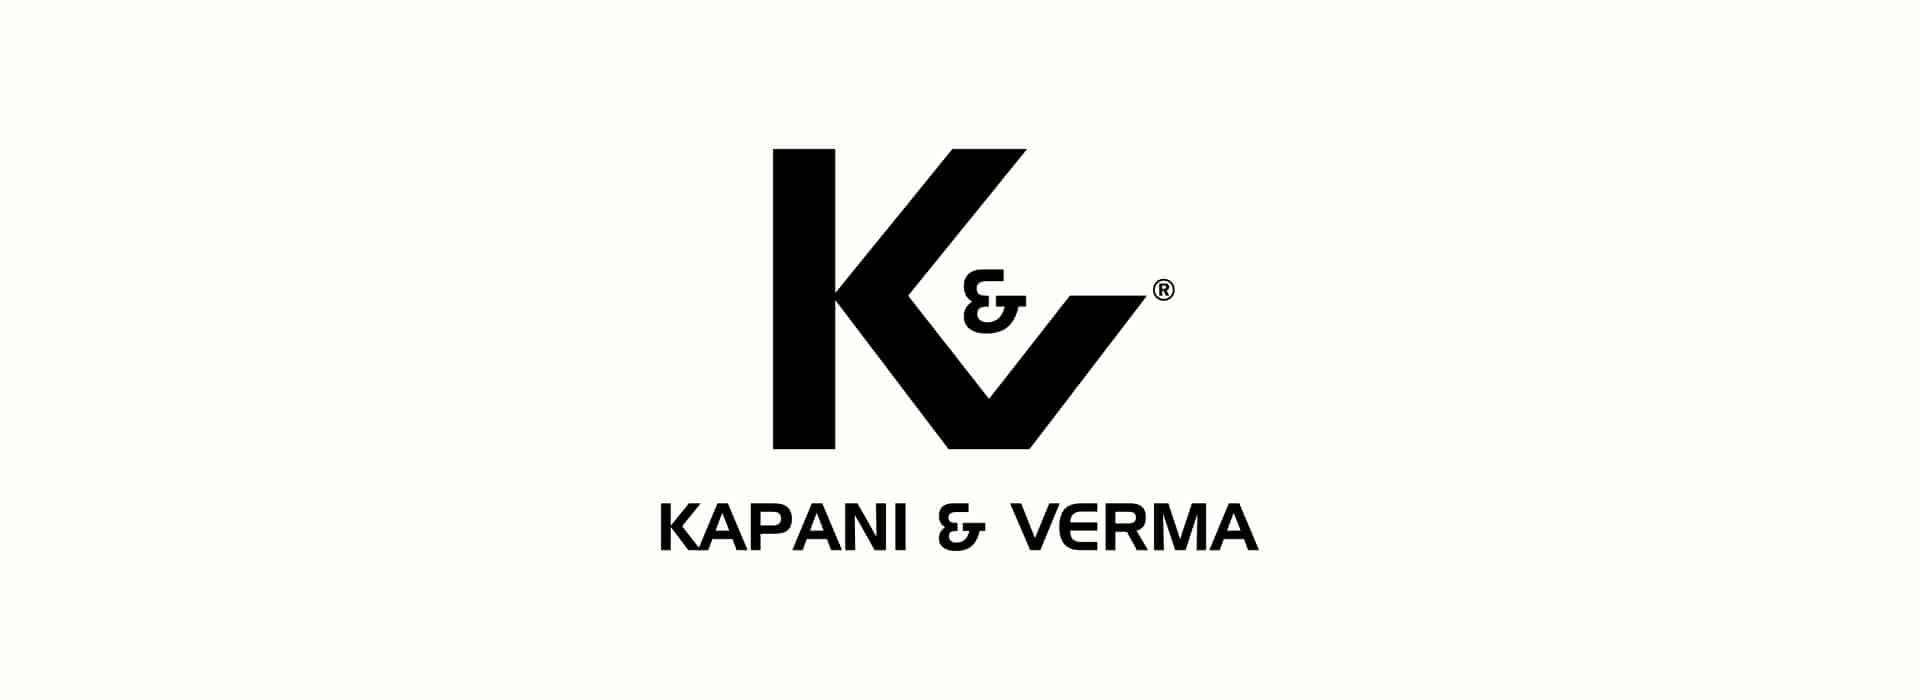 KV logo design positive